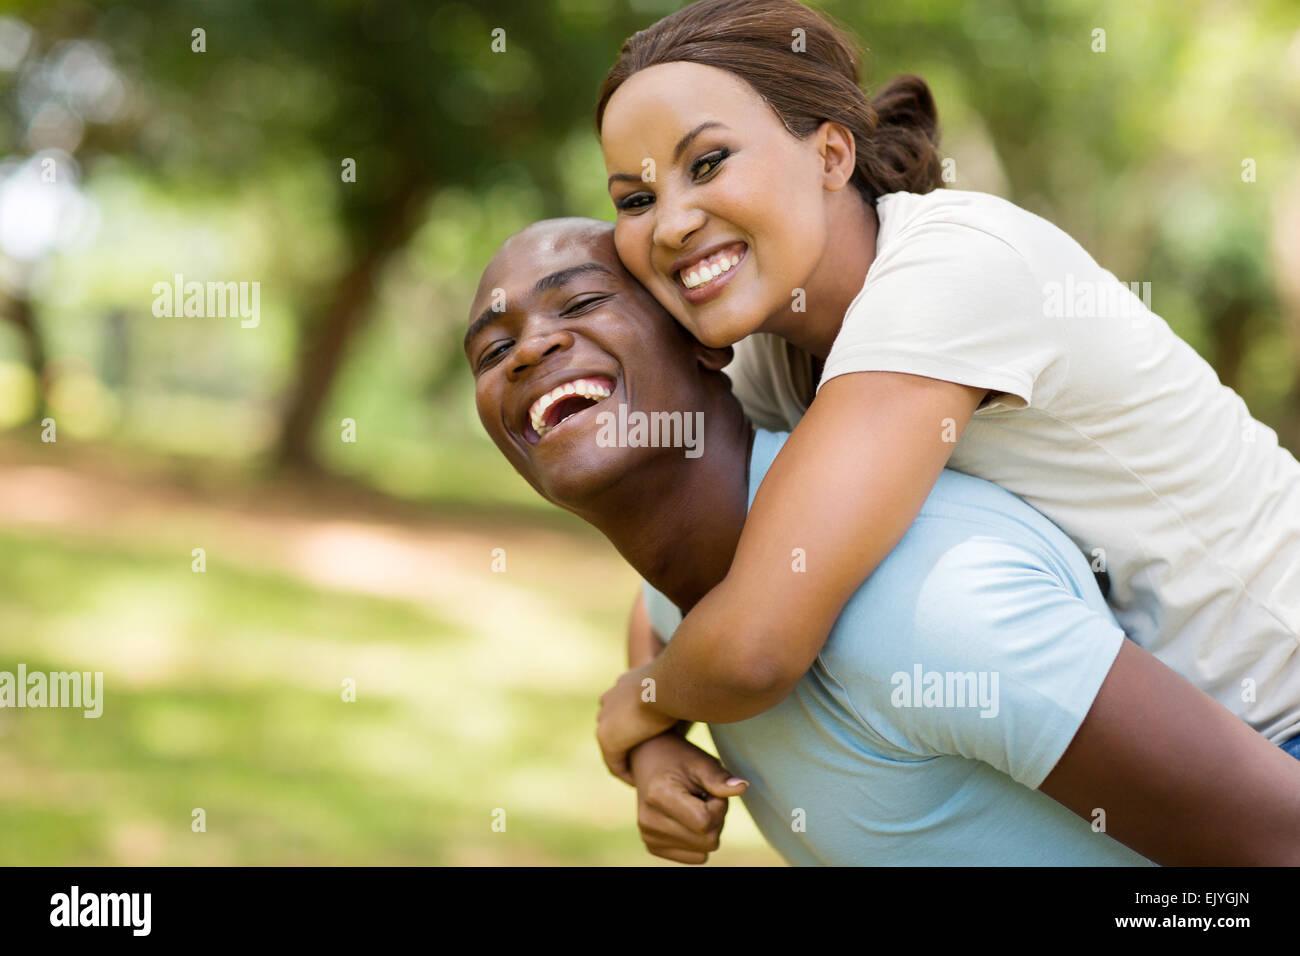 cheerful black woman enjoying piggyback ride on boyfriends back outdoors - Stock Image